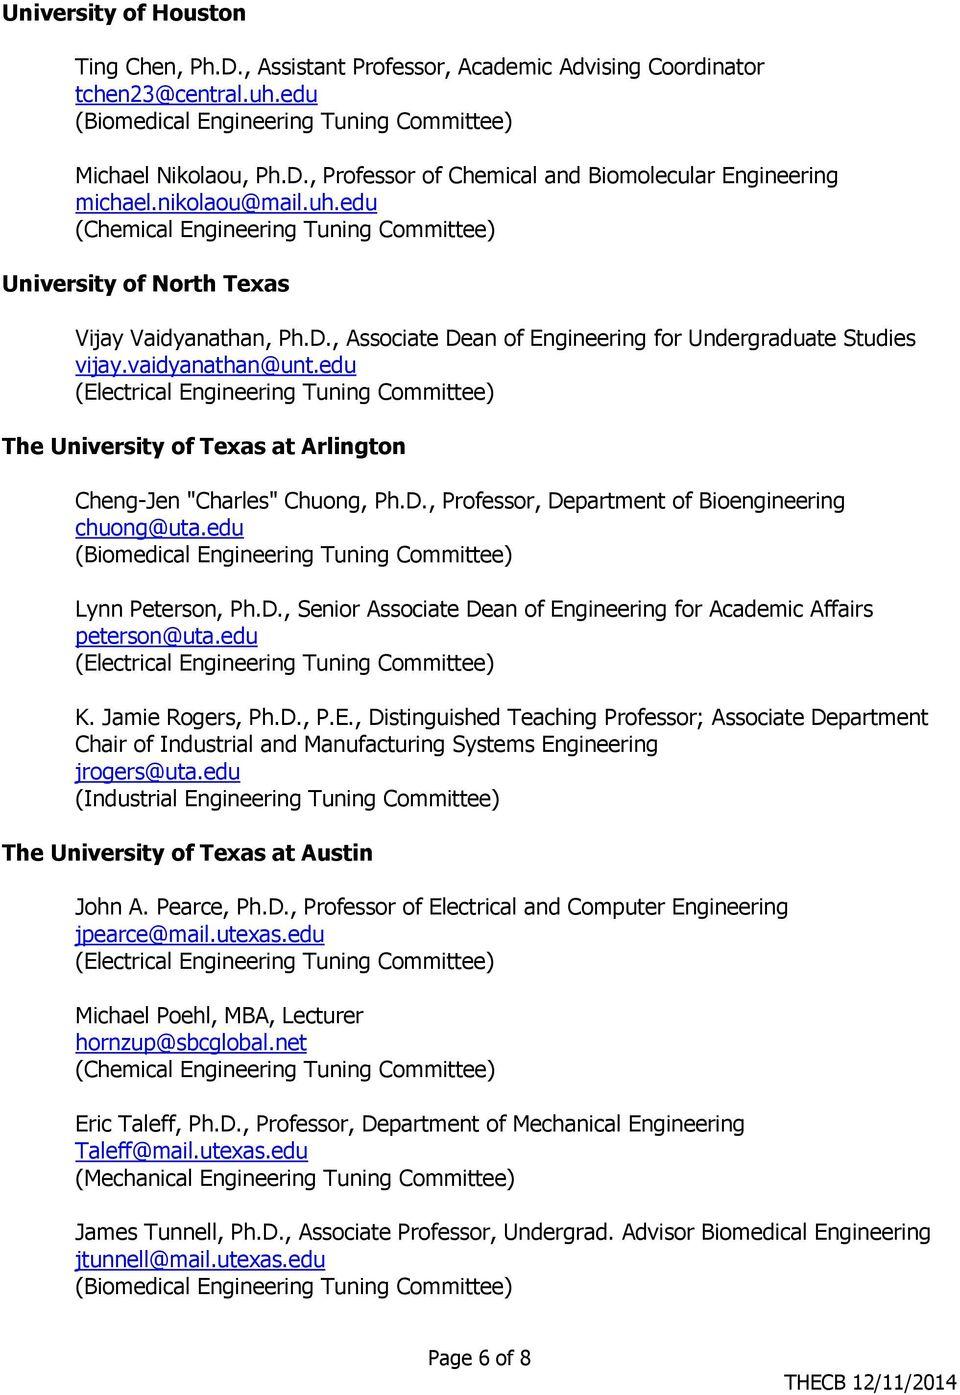 hight resolution of edu the university of texas at arlington cheng jen charles chuong ph